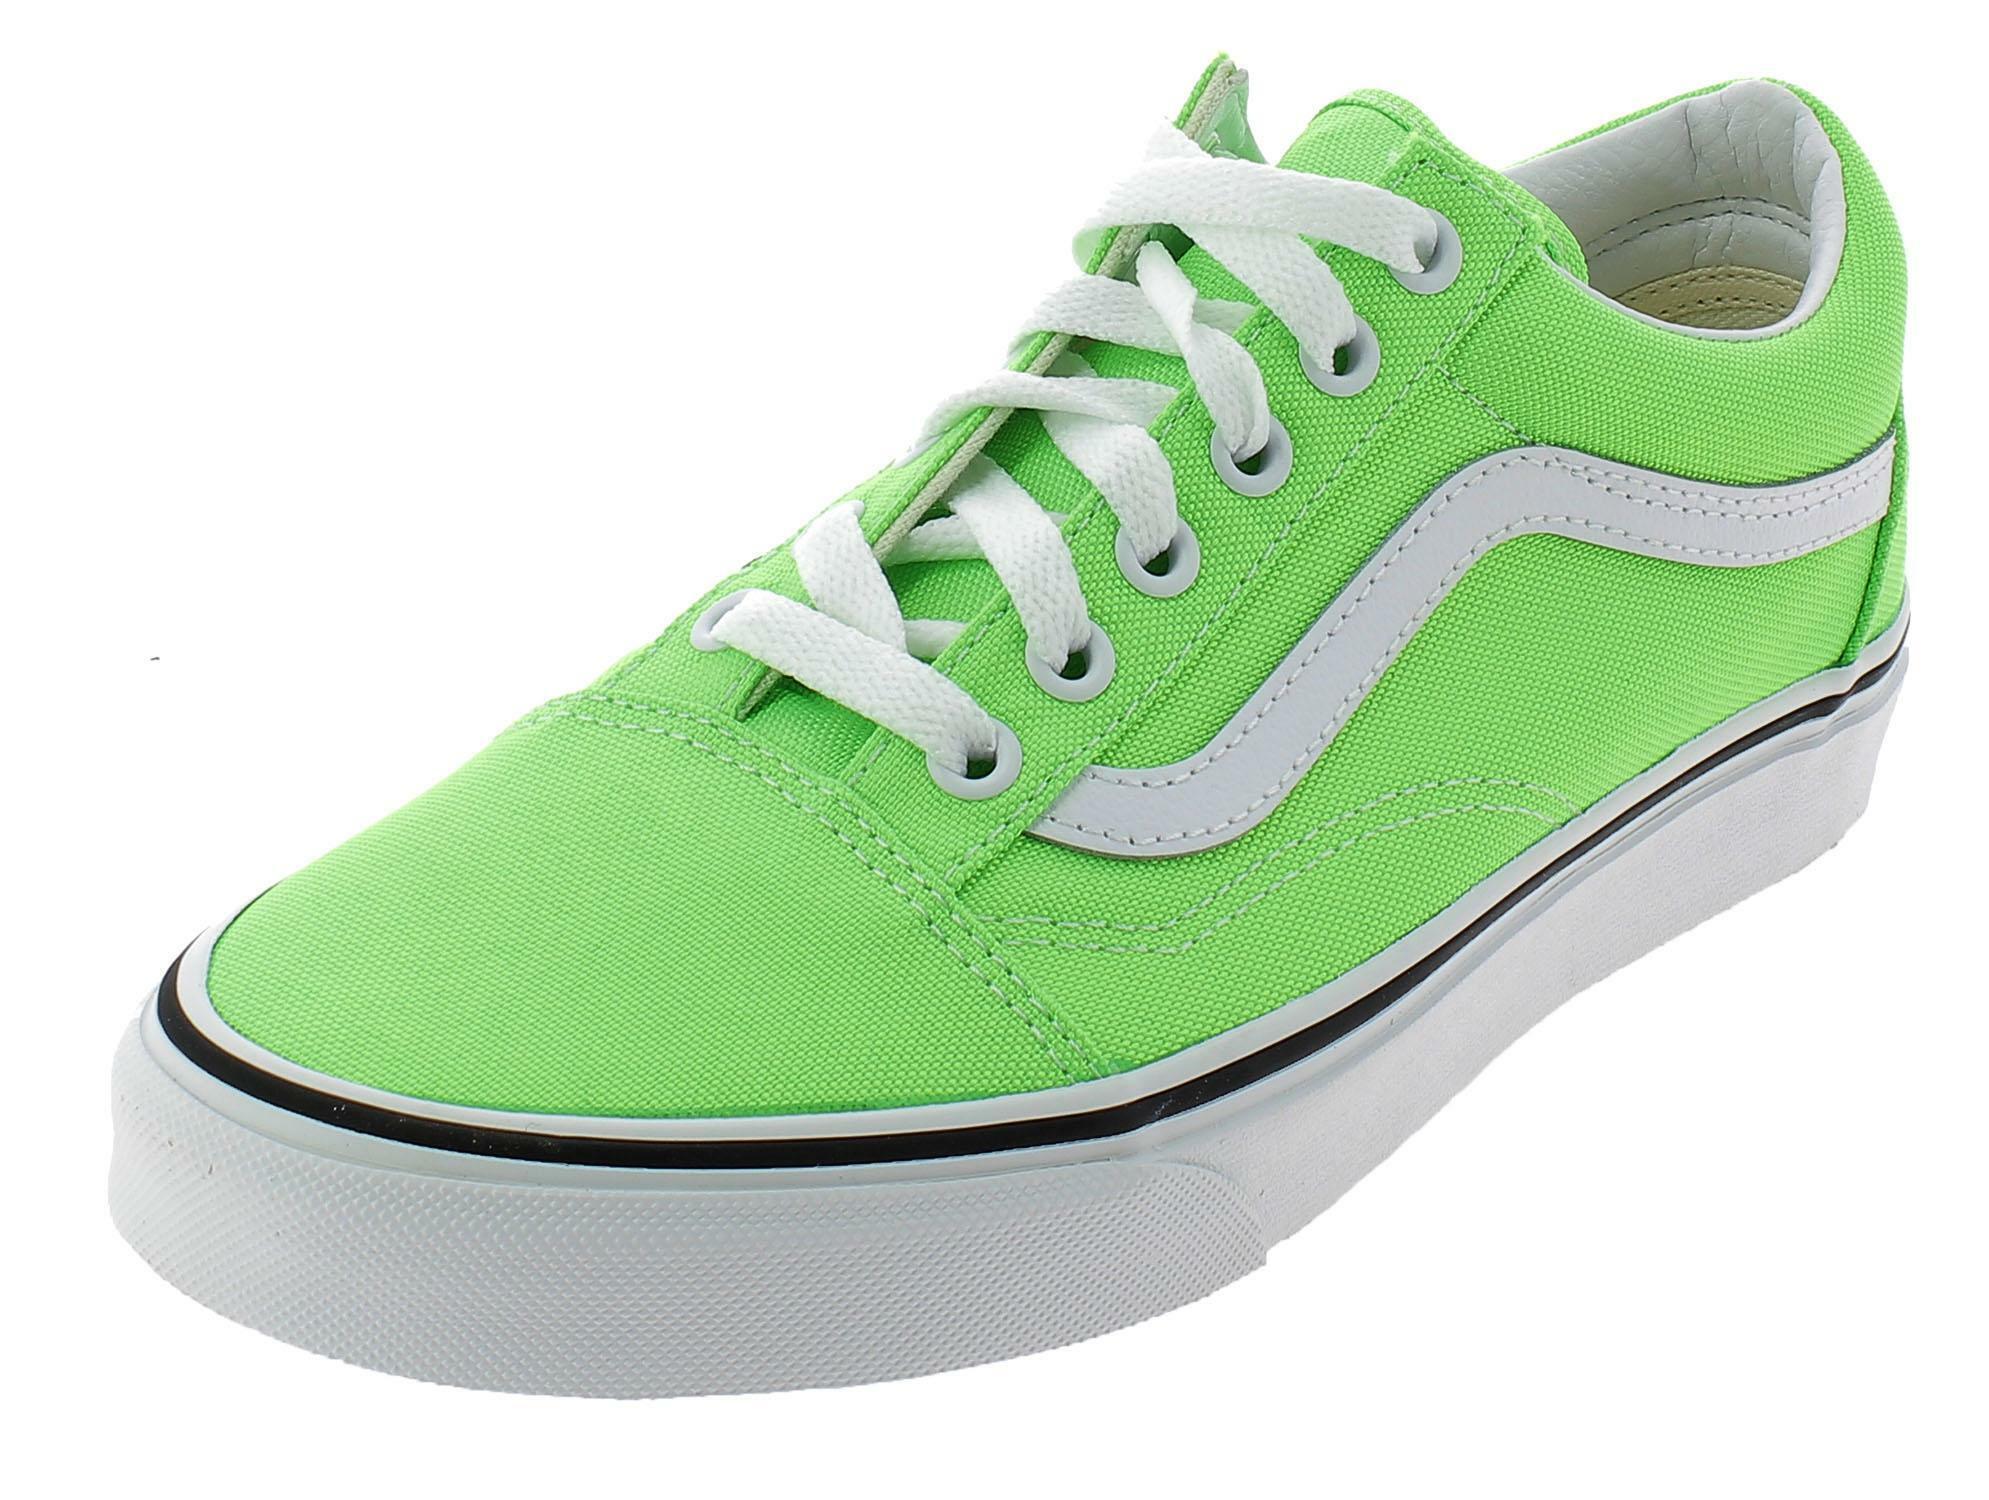 Vans old skool scarpe sportive donna verdi neon vn0a4u3bwt51